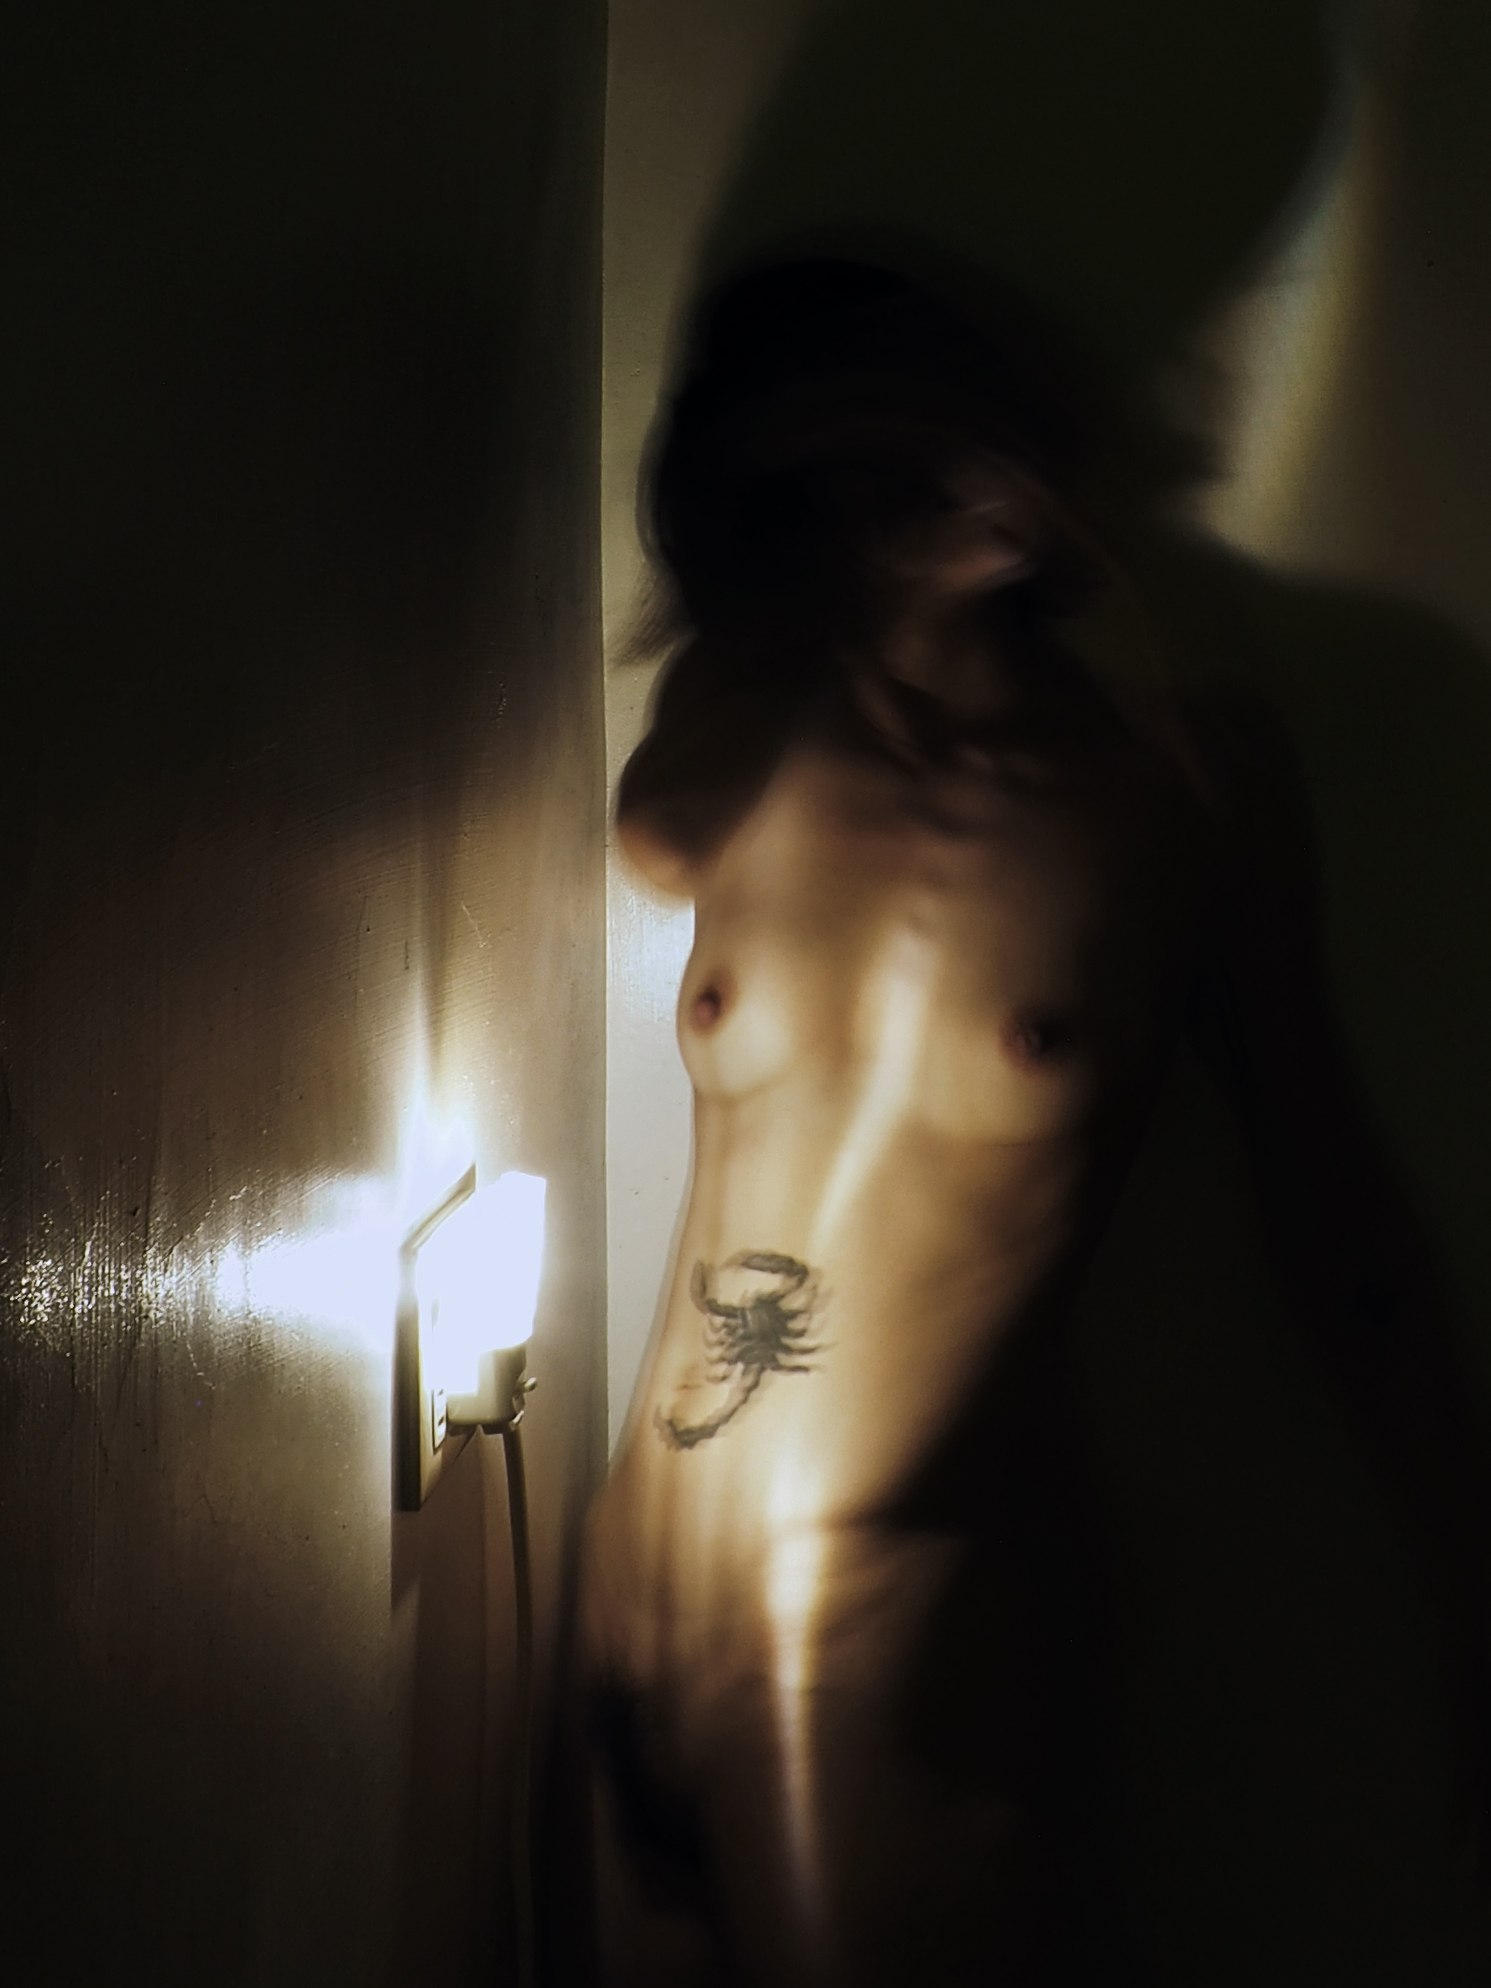 2021 / The Charm of Light I / 45x60 cm / Photo by Suelynee 何書伶